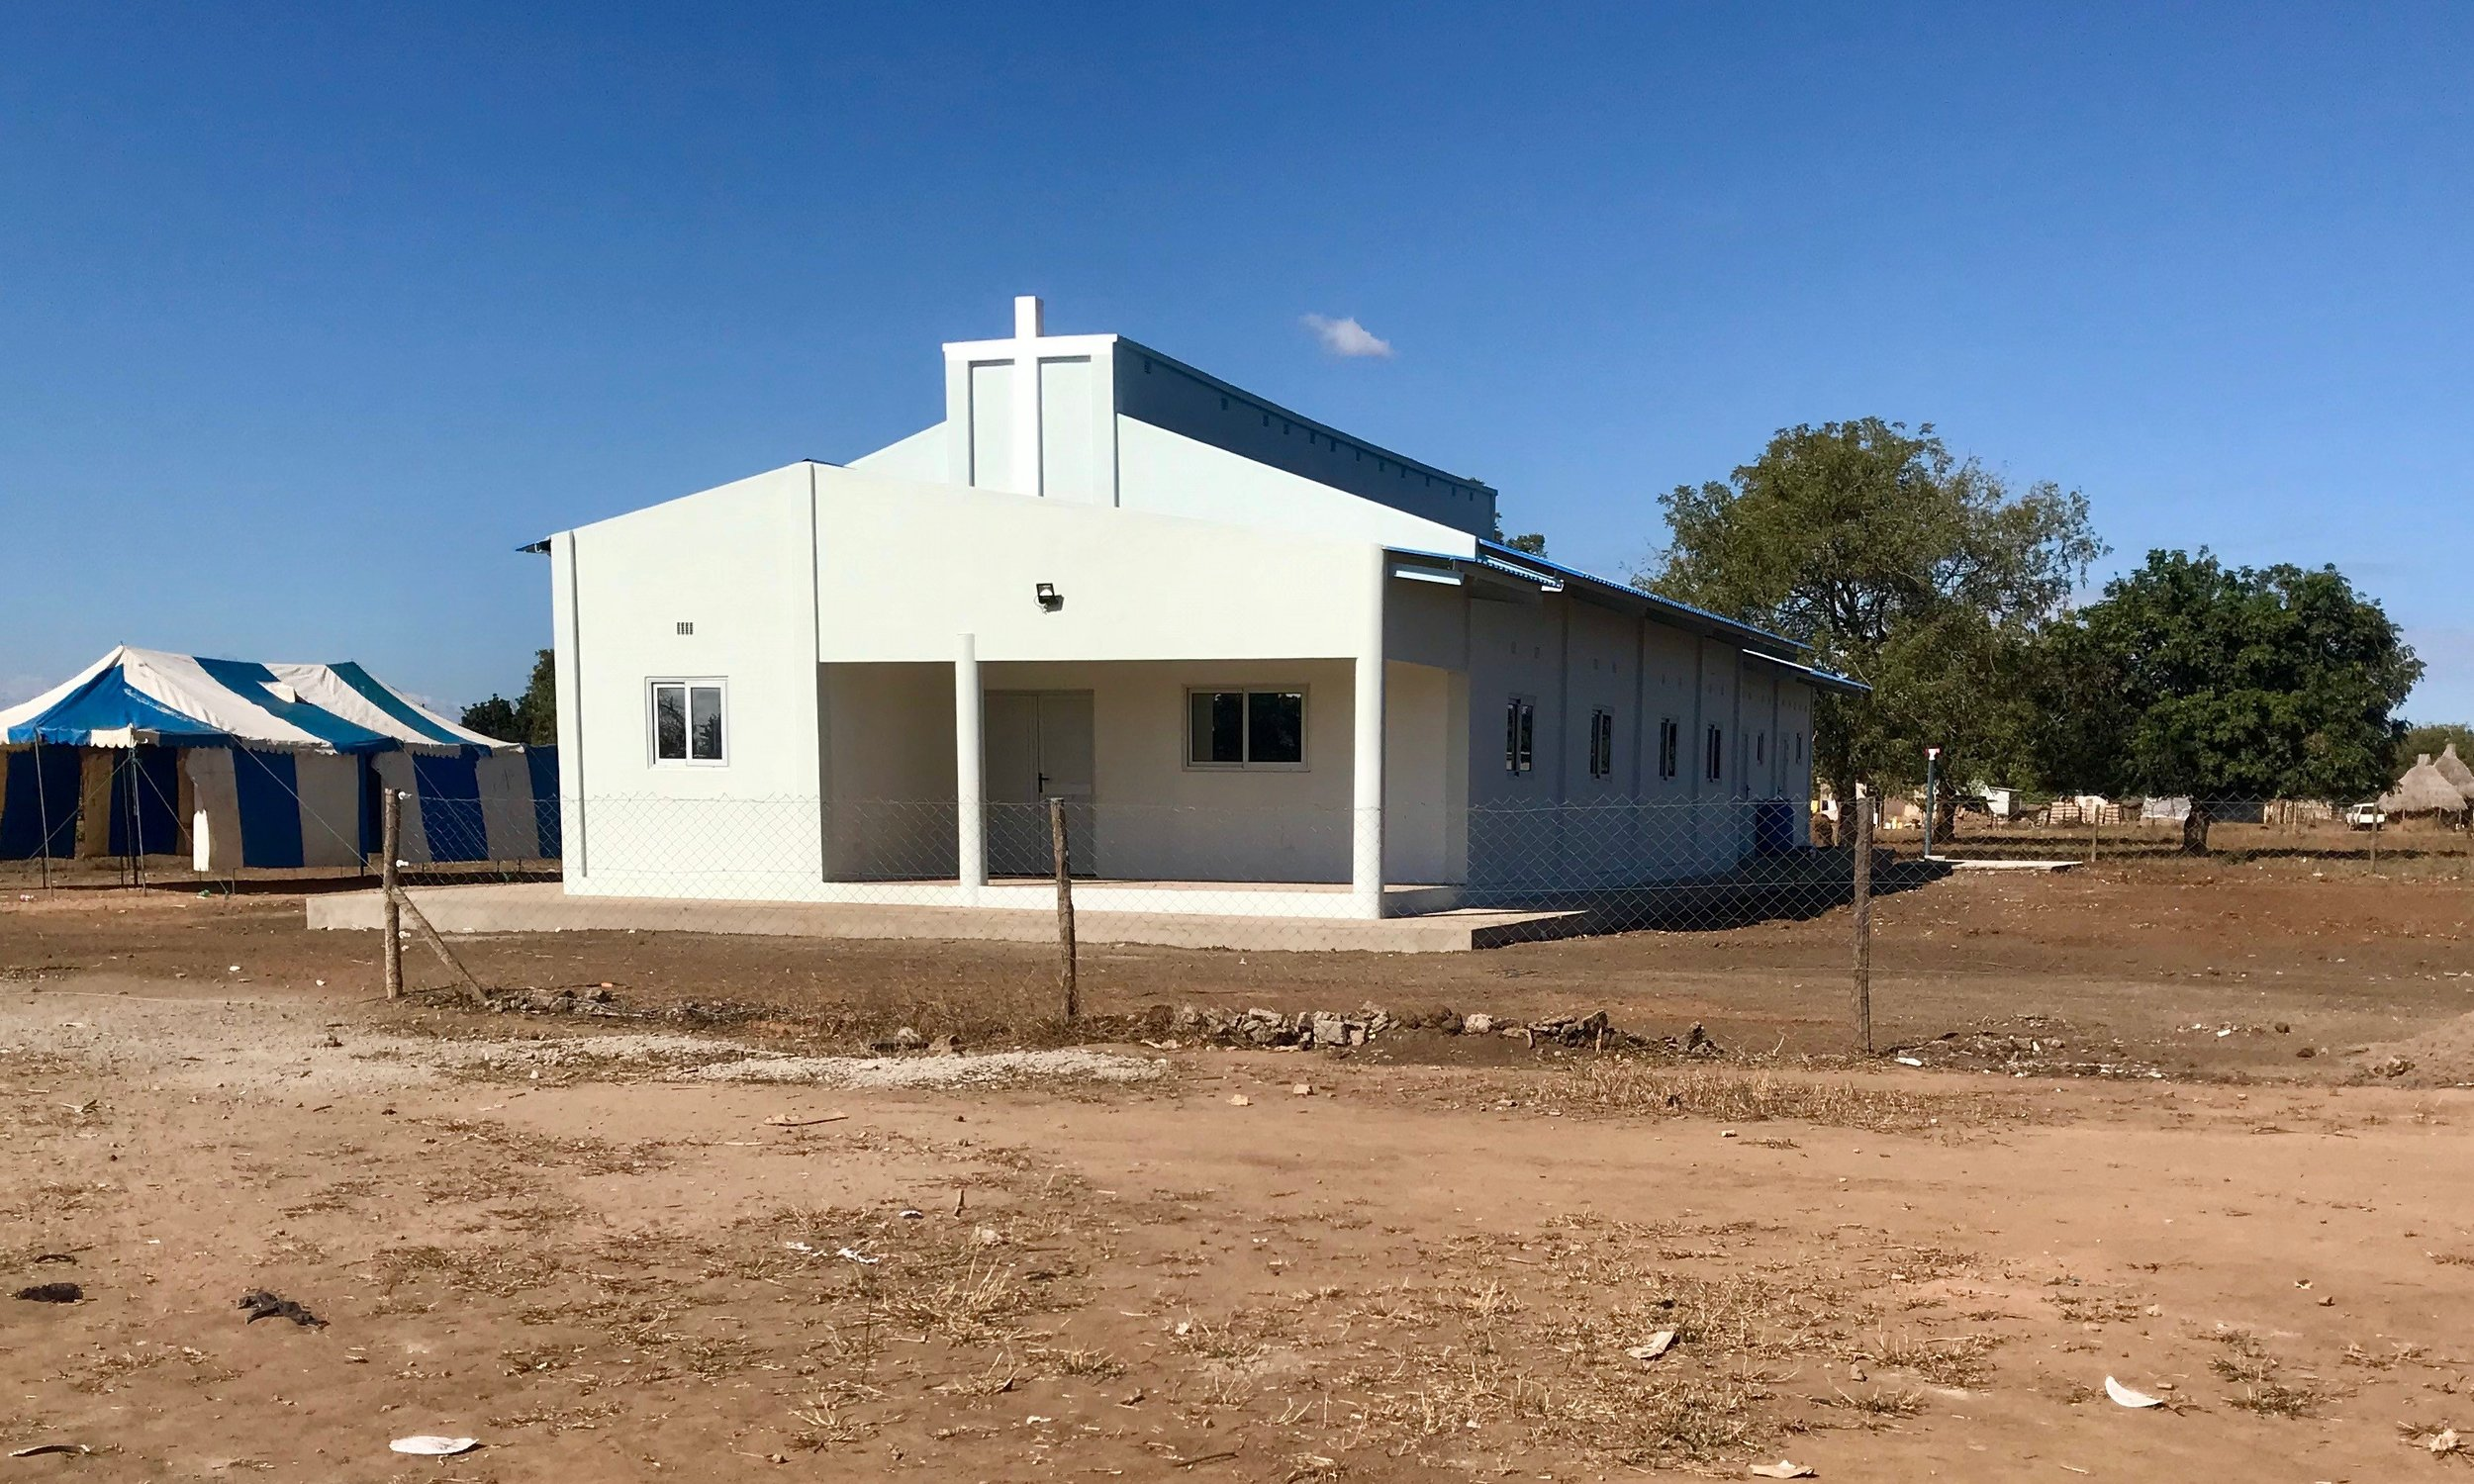 WOW Moz Macalawane Church Building 20190813.jpg